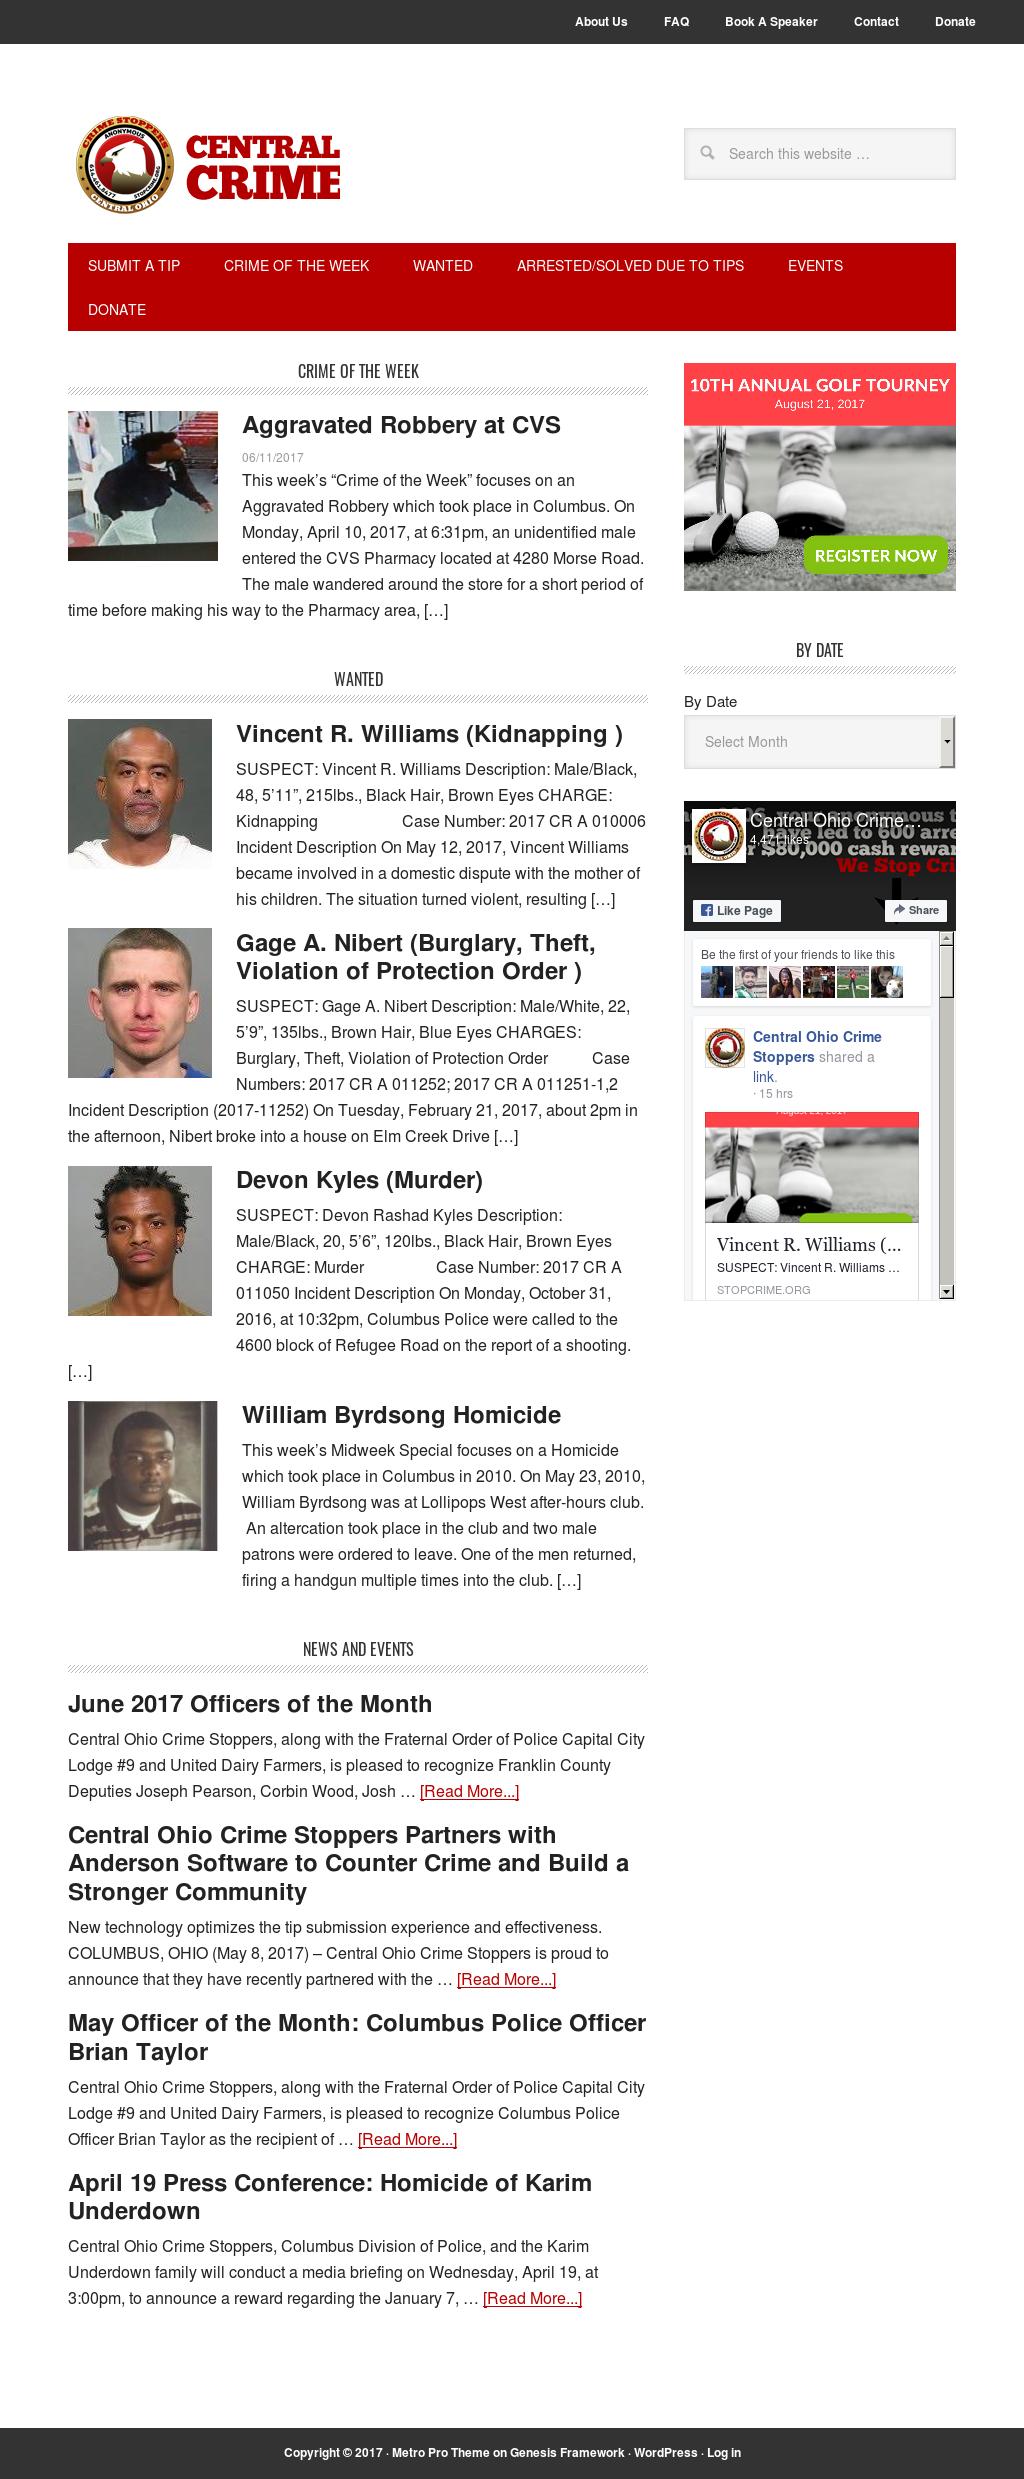 Central Ohio Crime Stoppers Competitors, Revenue and